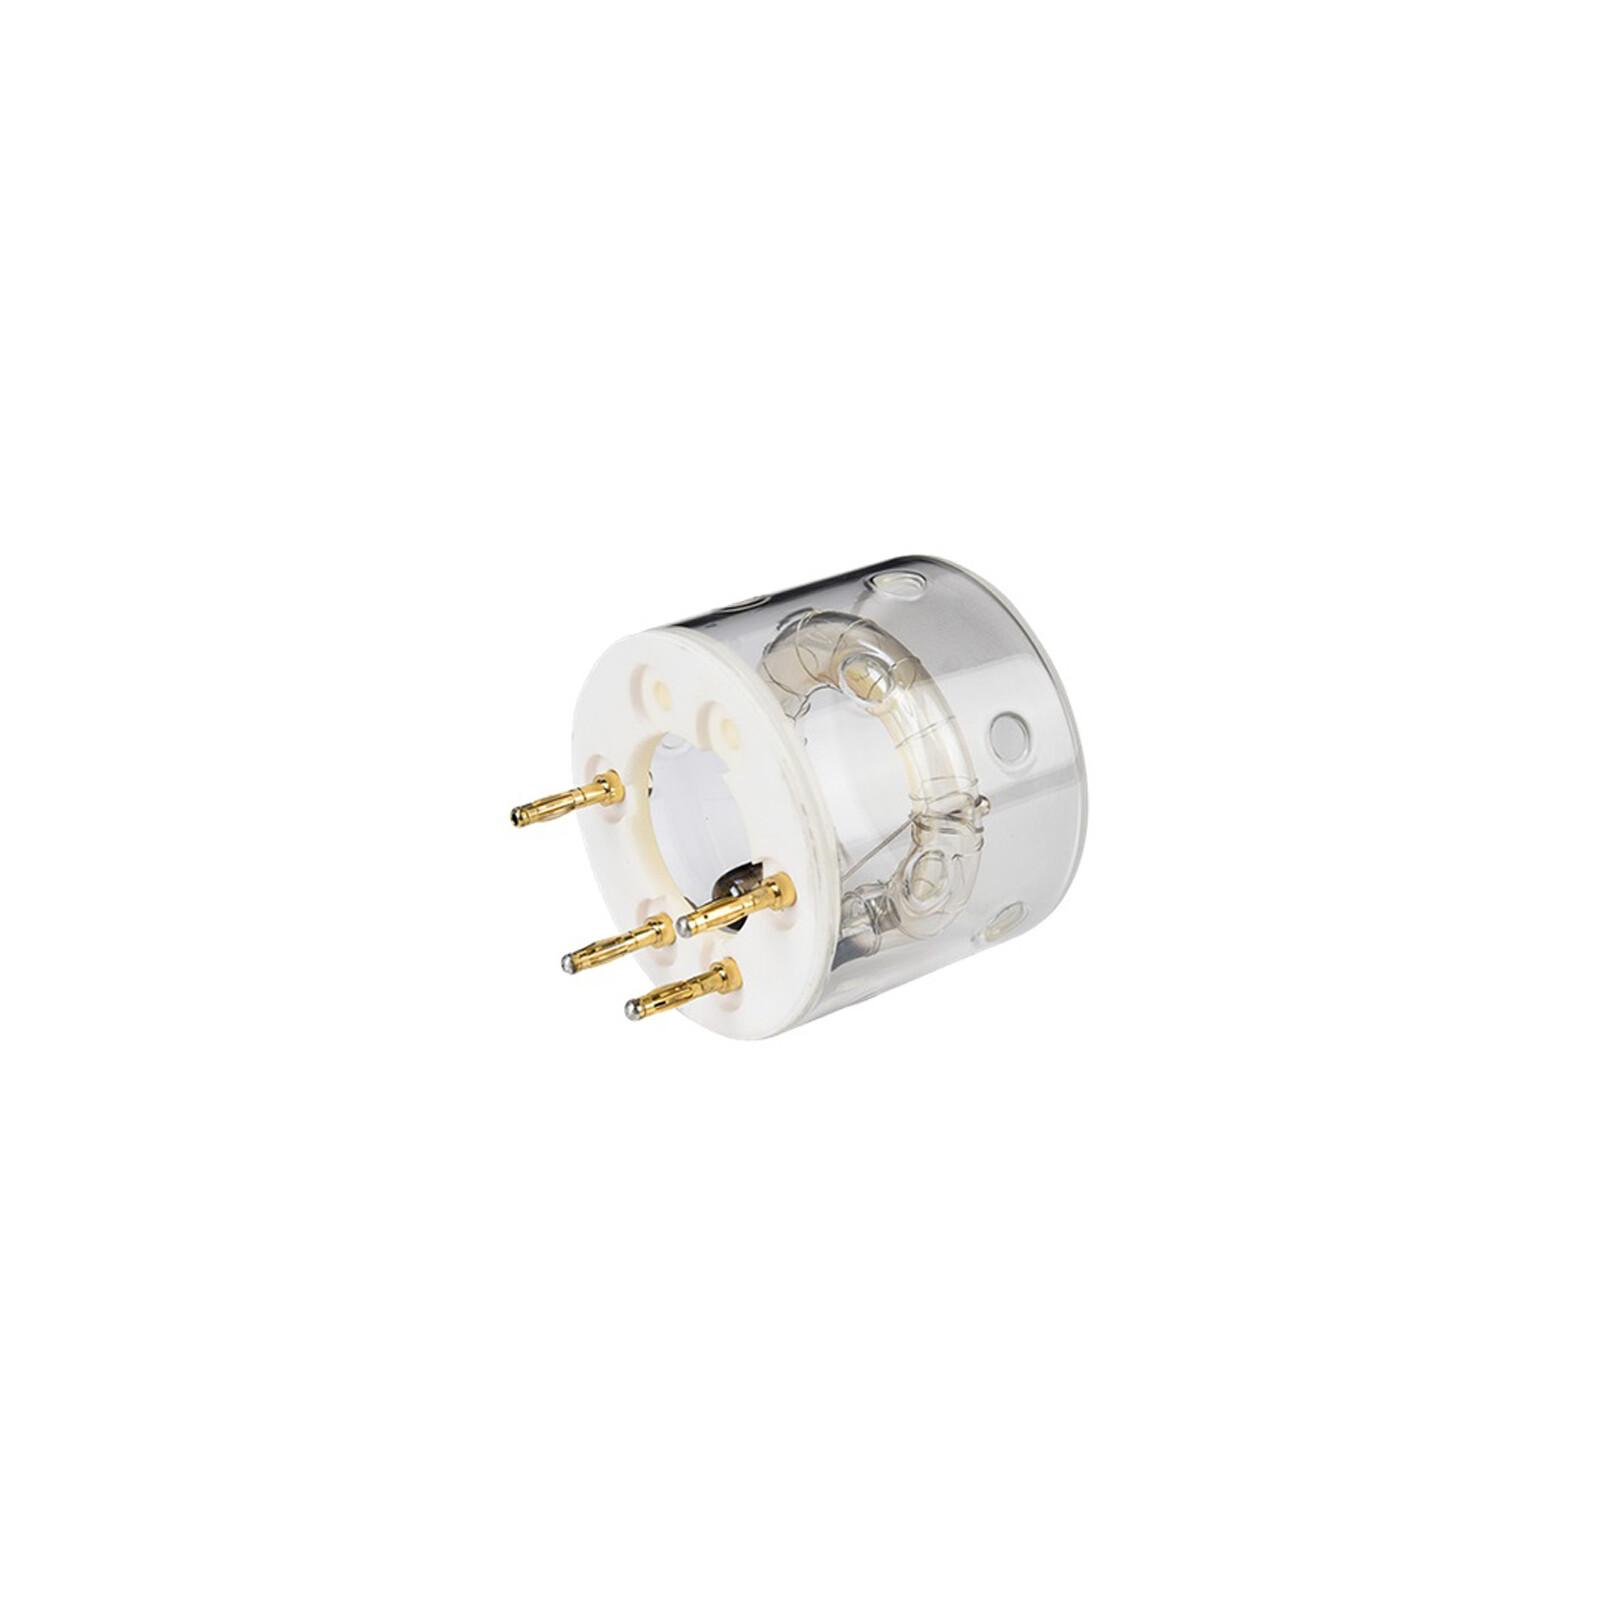 GODOX FTA-D600PRO Ersatzlampe AD600 PRO